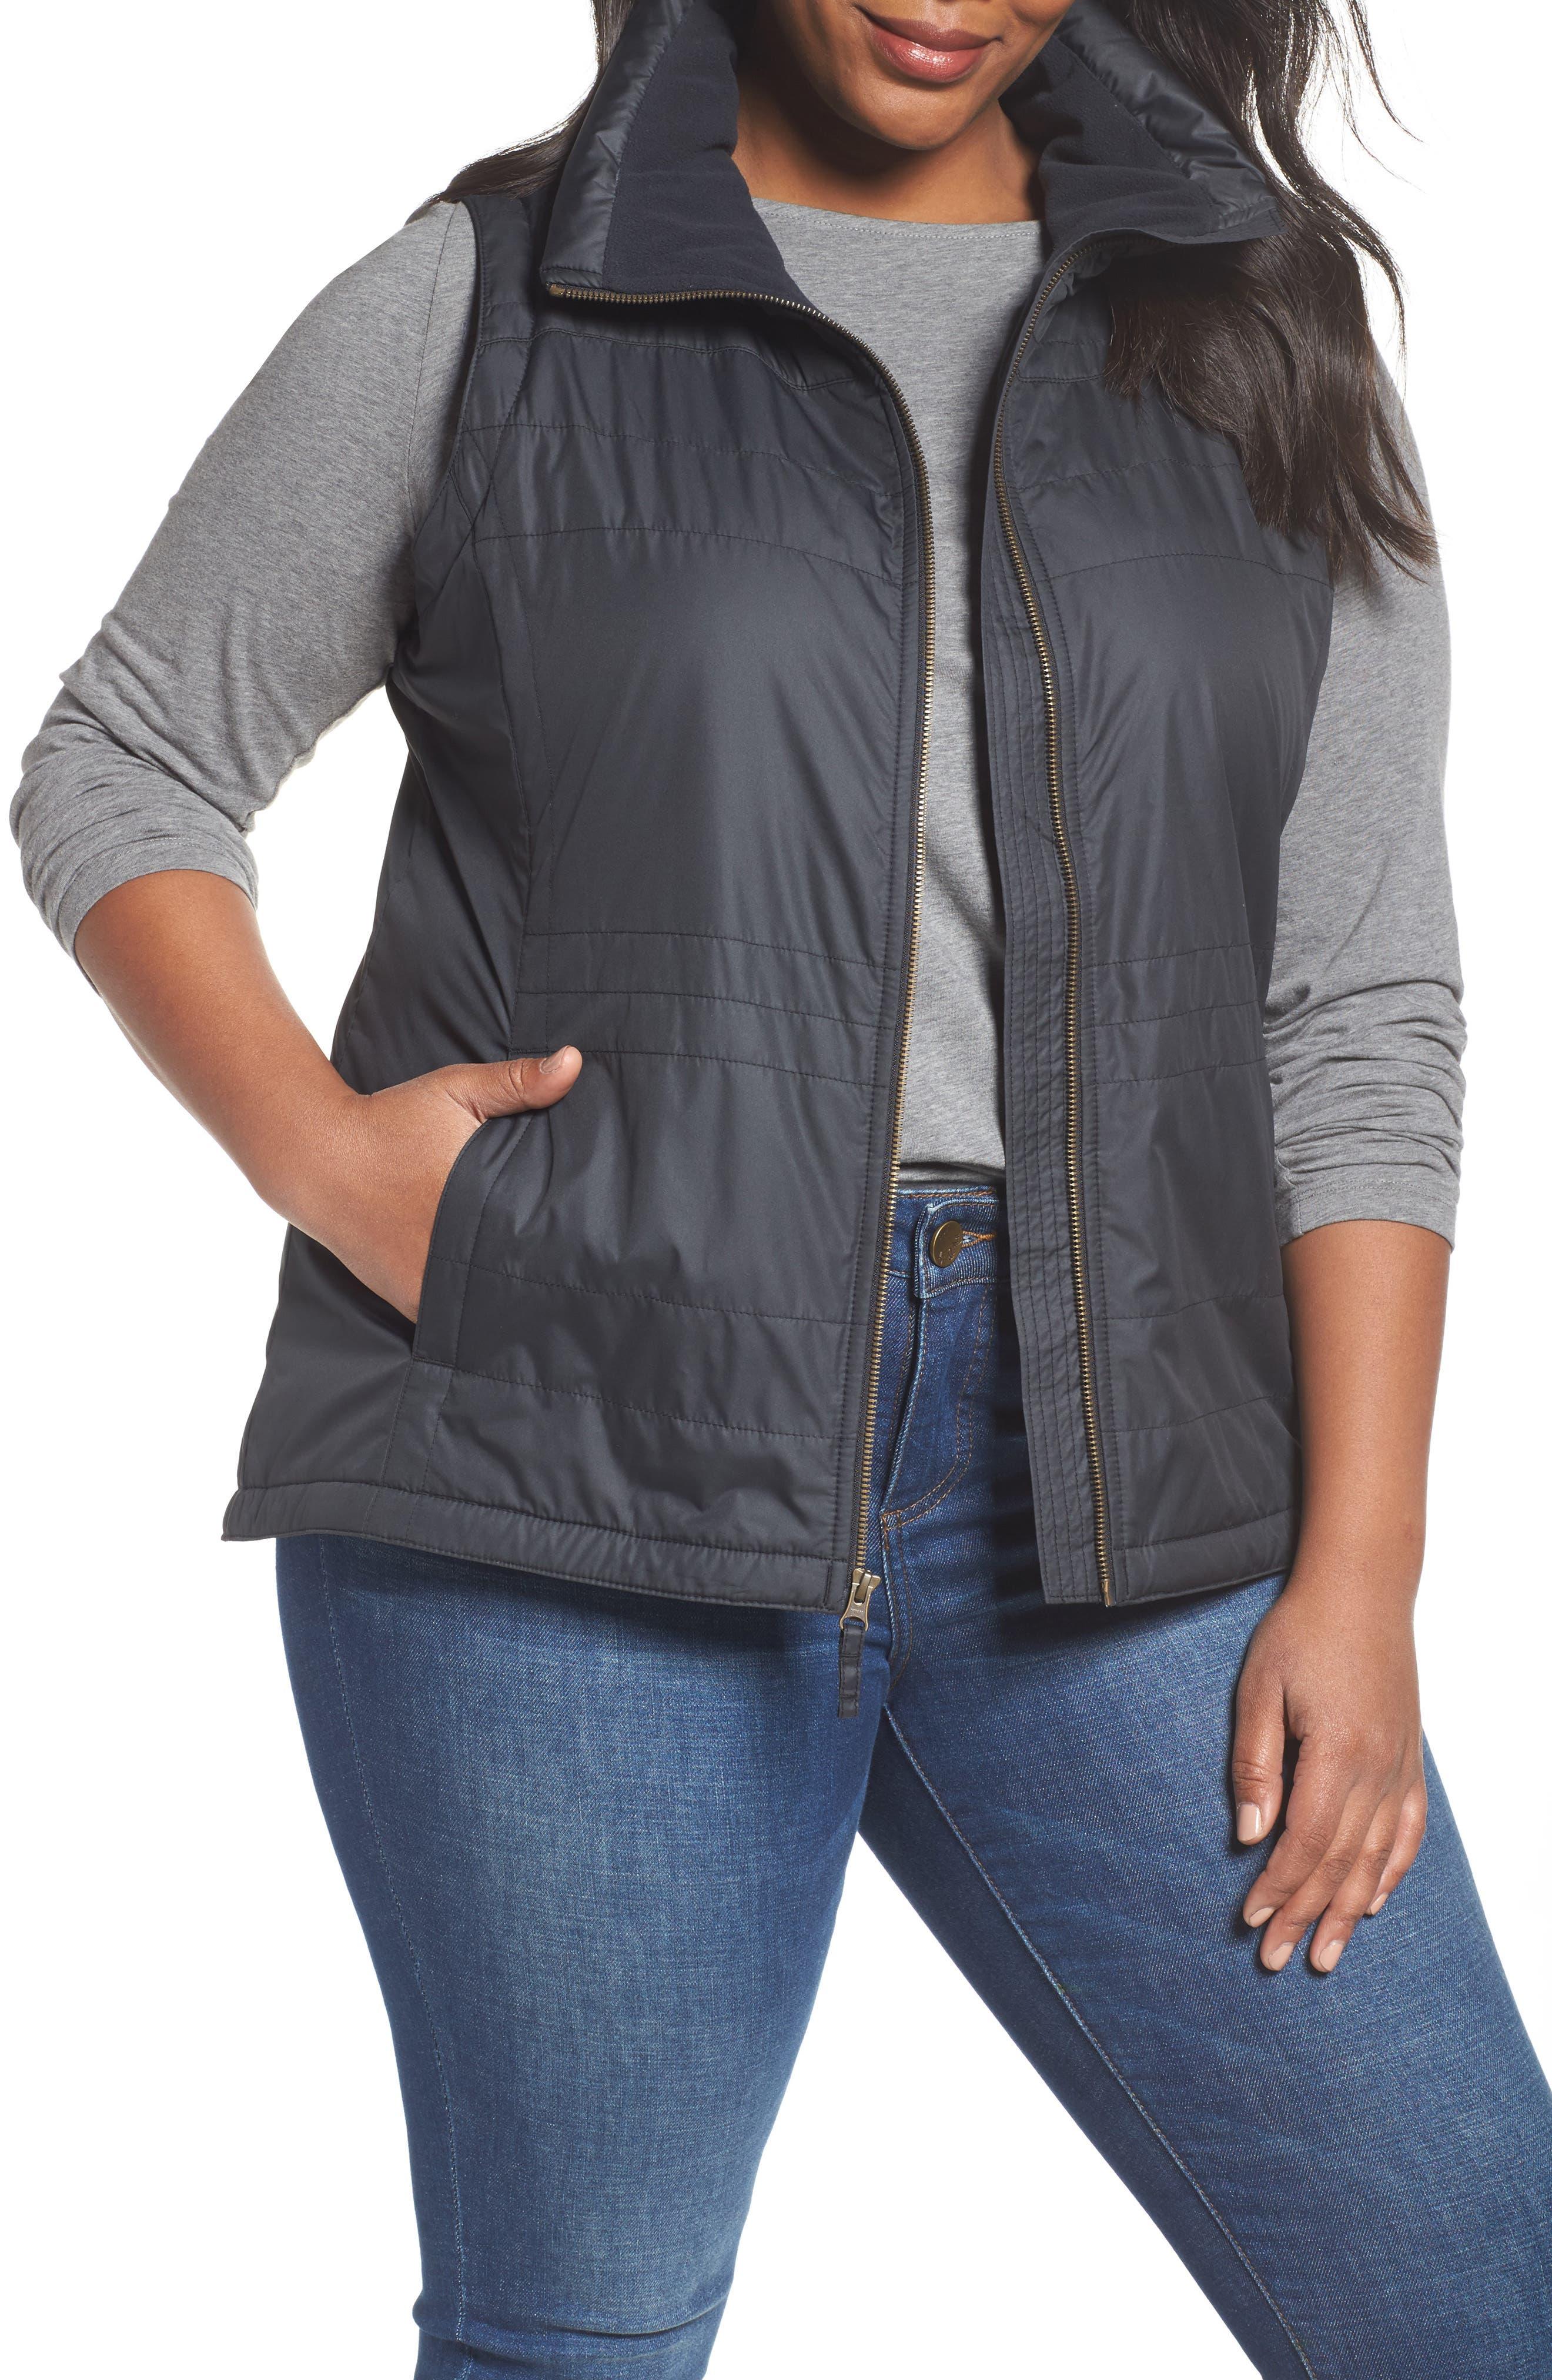 Shining Light II Quilted Vest,                         Main,                         color, Black